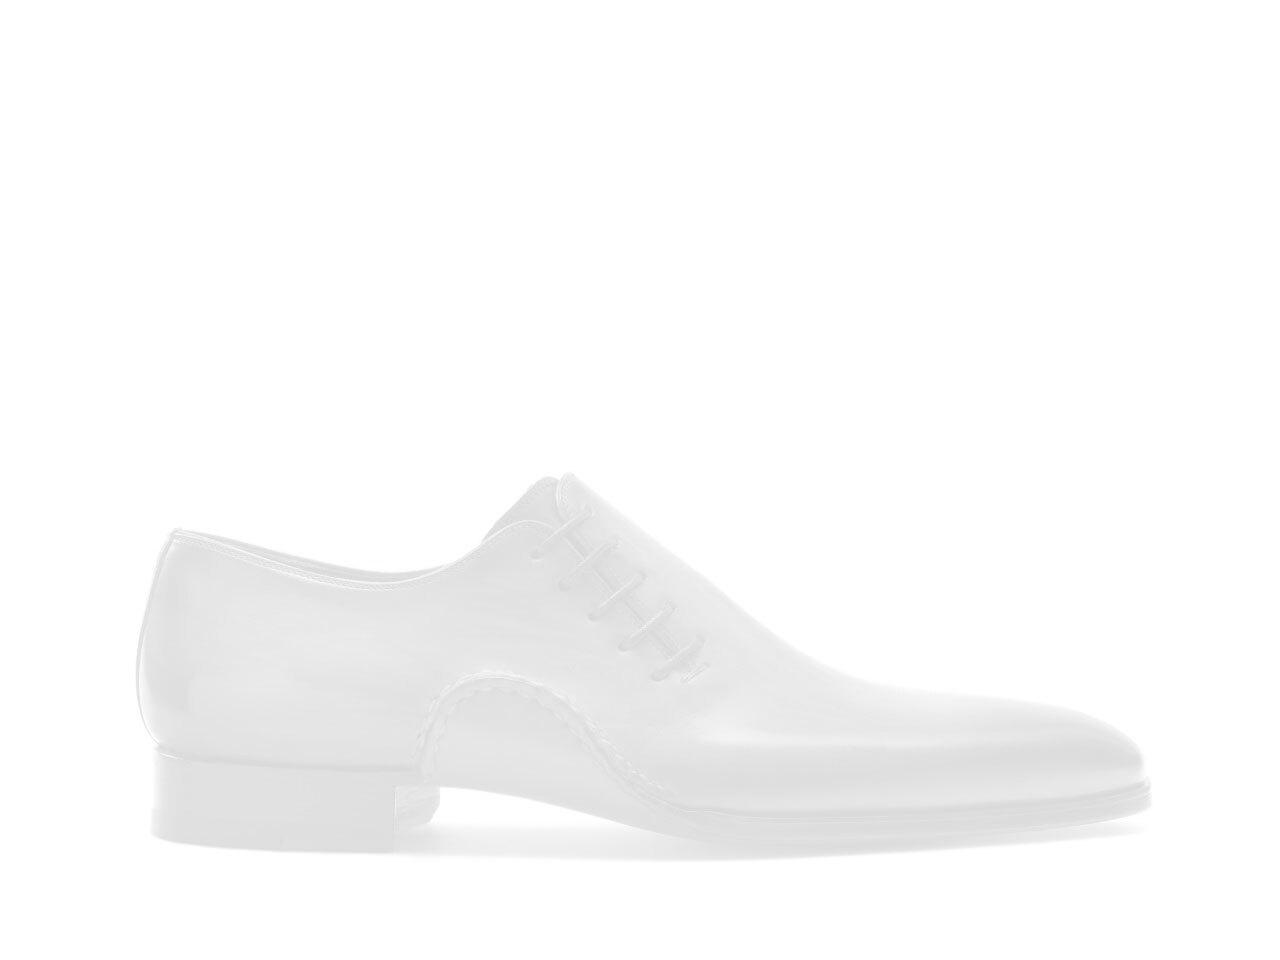 Pair of the Magnanni Volar Grey Men's Sneakers